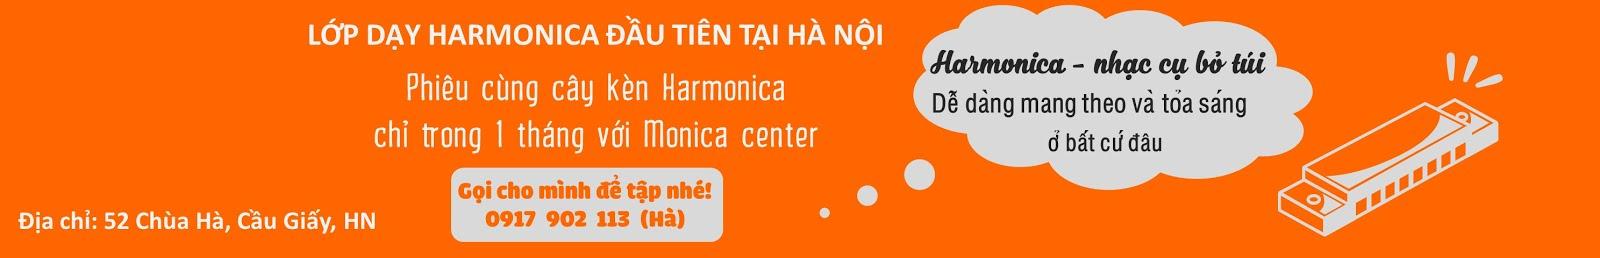 Harmonica Vietnam